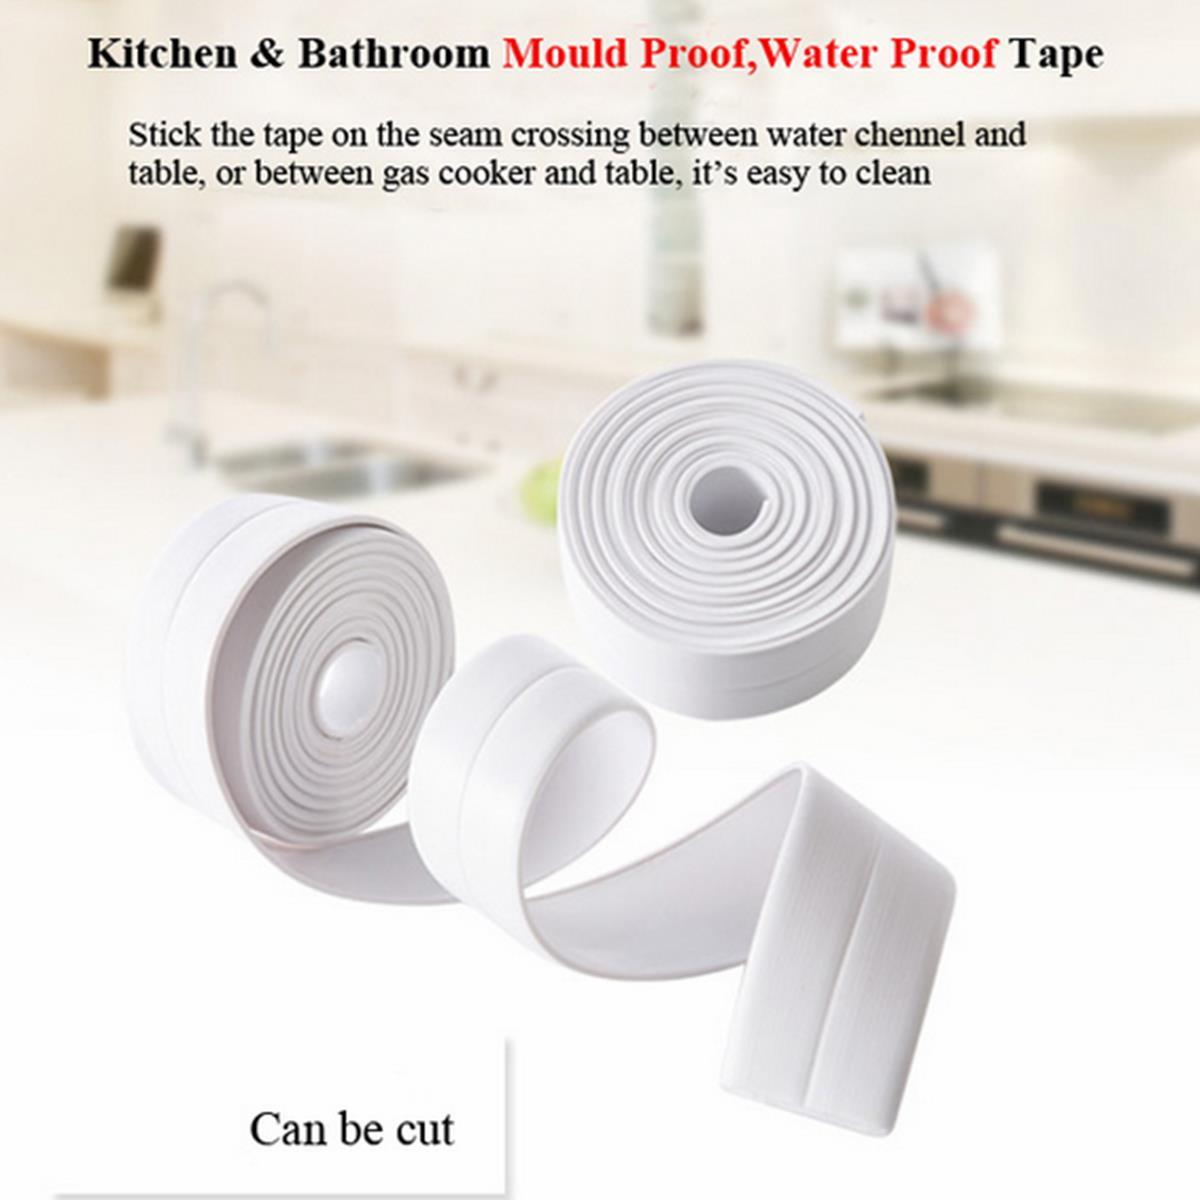 Honana Kitchen Bathroom Wall Seal Ring Tape Waterproof Tape Mold Proof Adhesive Tape